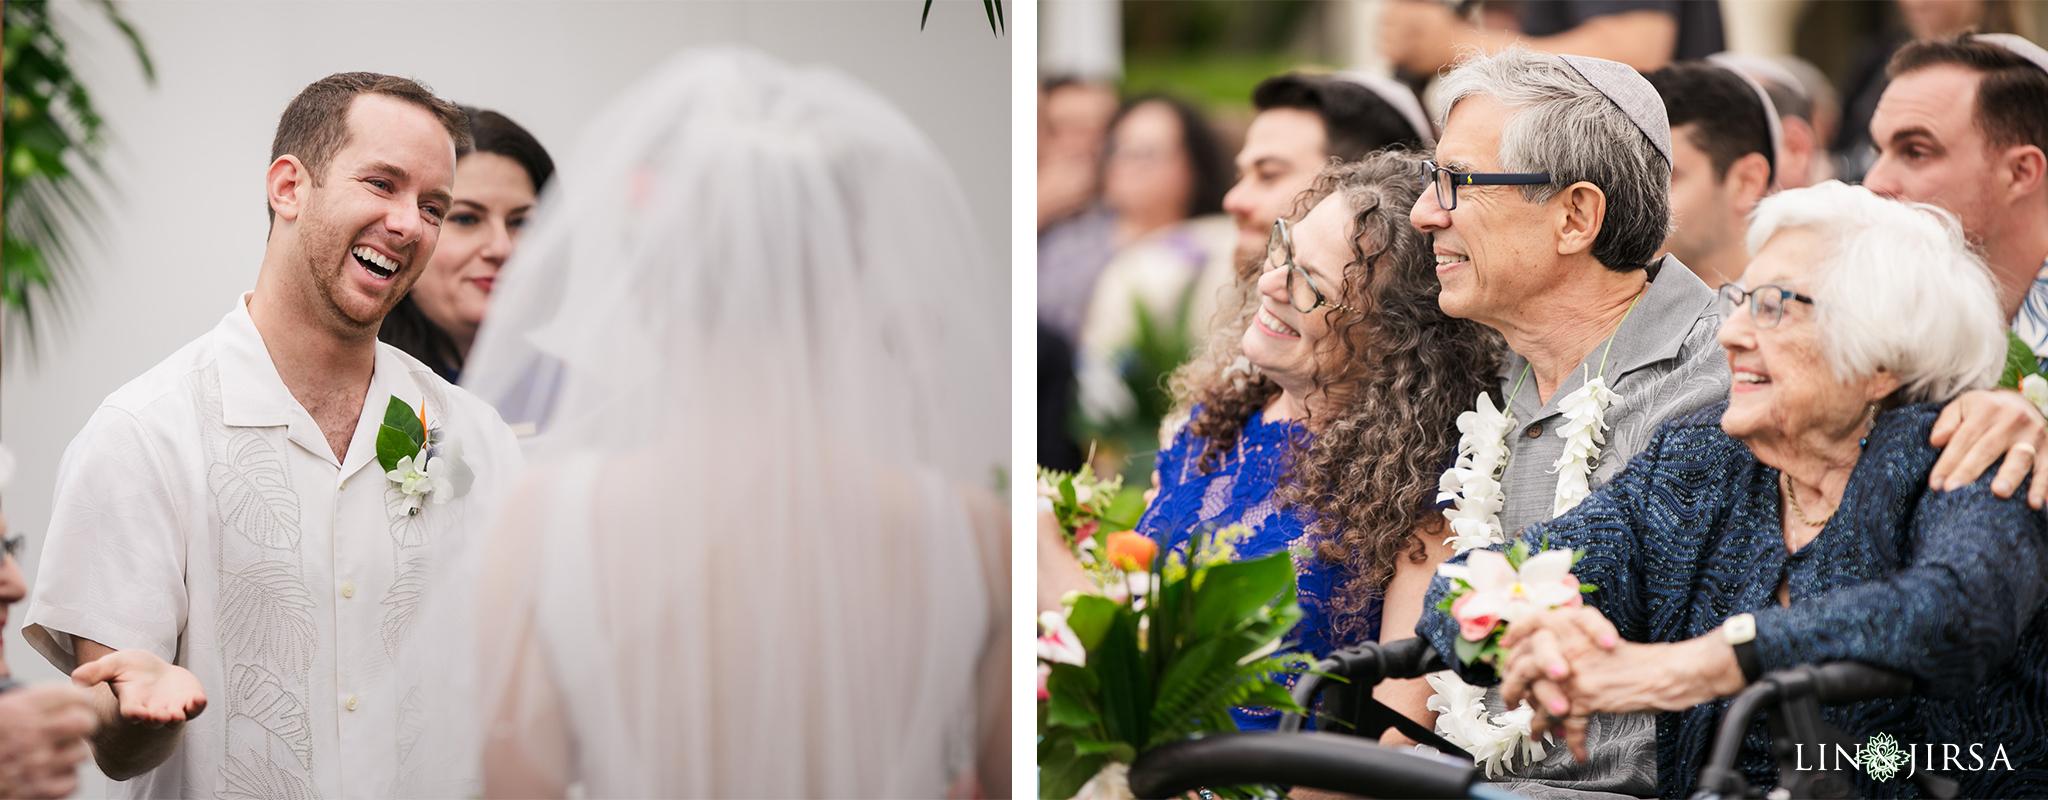 35 Hyatt Regency Huntington Beach Orange County Jewish Wedding Photography